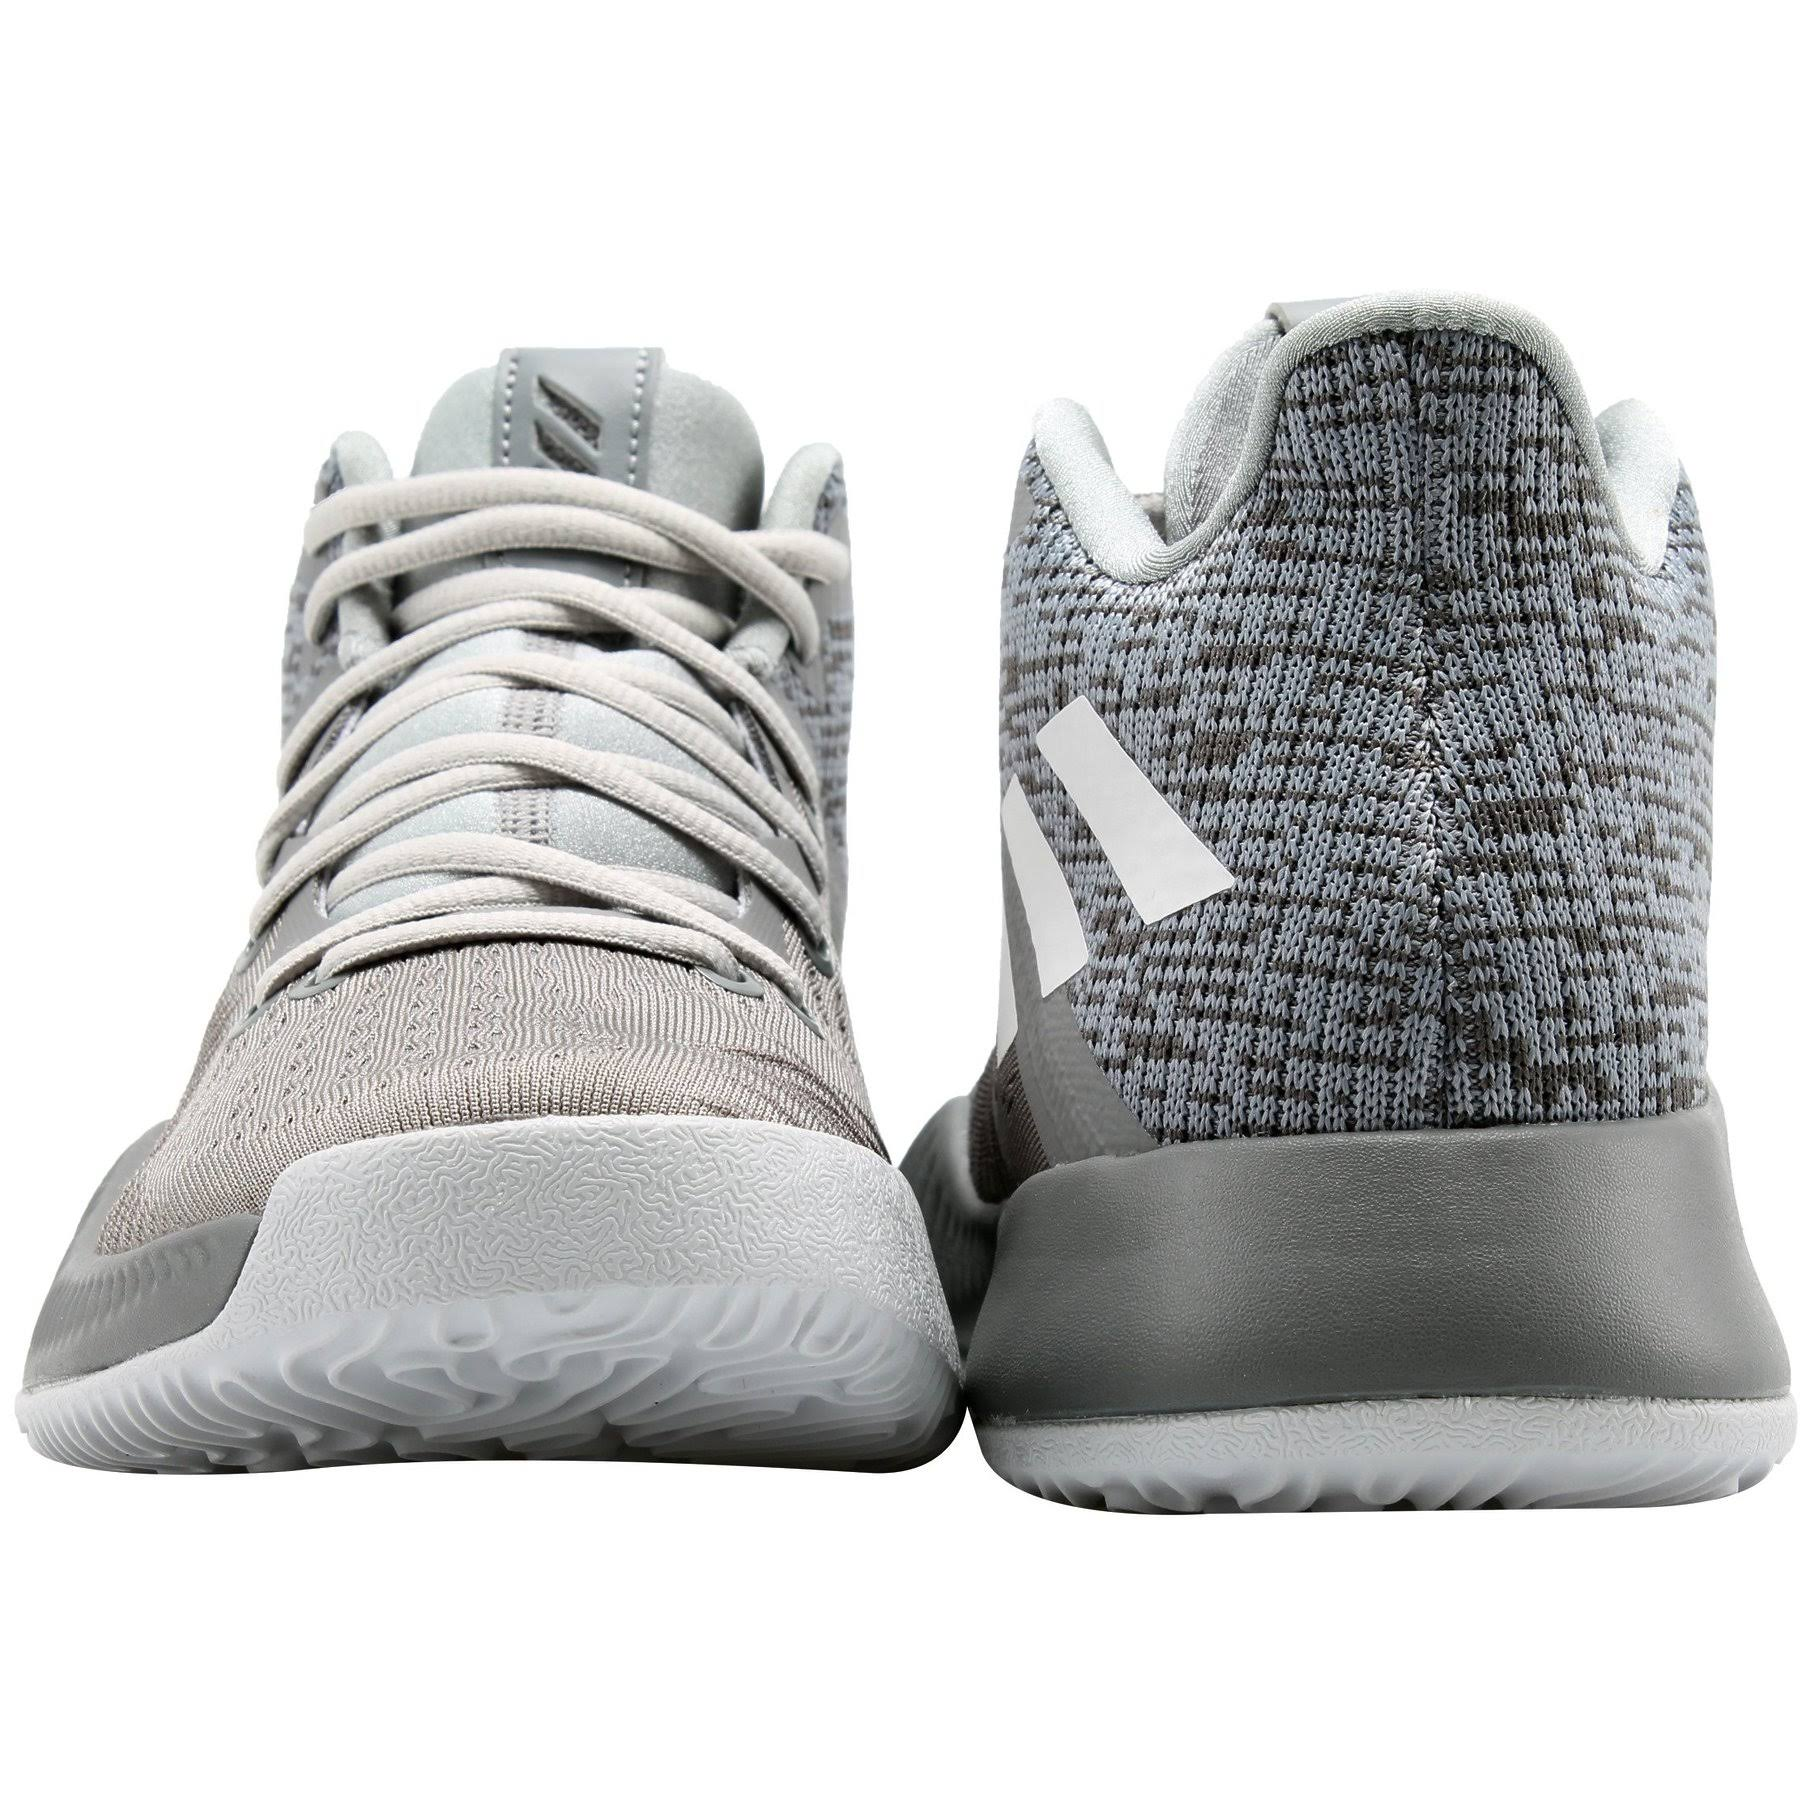 5 Adidas Bounce Da9781 Grey Weiß Herren Vier Mad Größe 11 Basketballschuhe Grau Three TrHTw